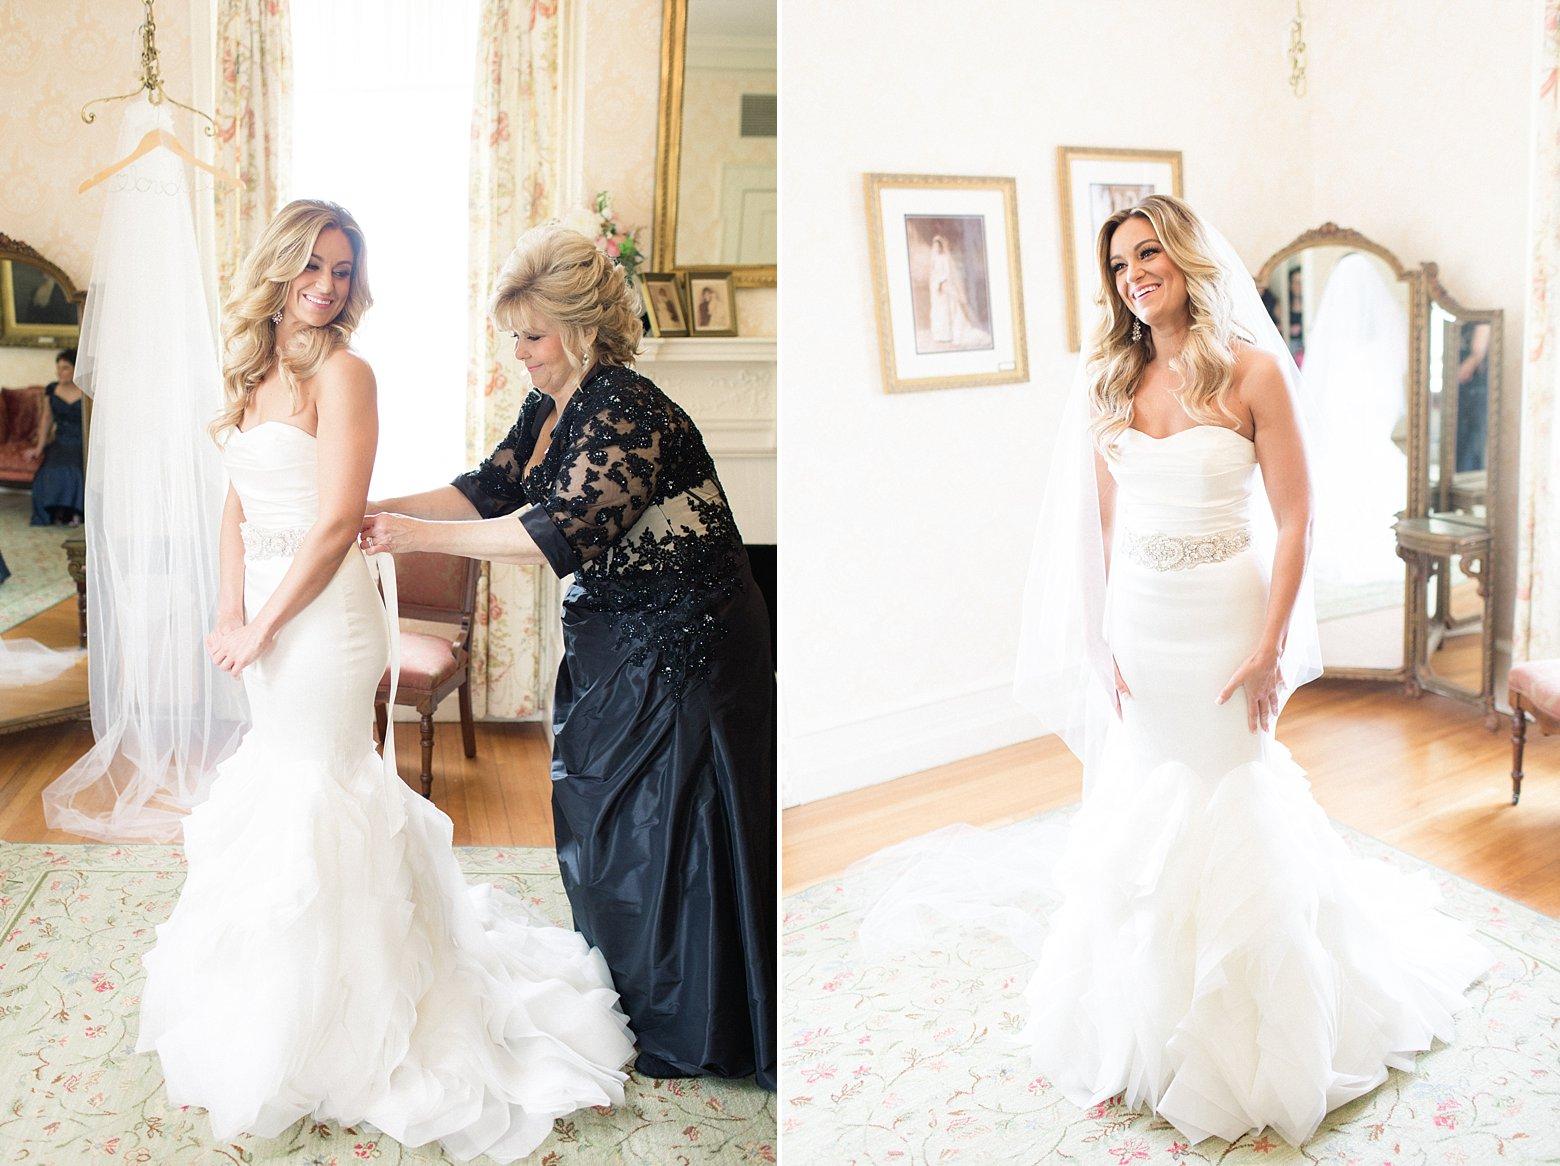 lauren_fair_photography_april_lynn_designs_stasia_matt_spring_cairnwood_estate_wedding_northeast_philadelphia_blush_pink_gold_wedding_invitation_stationery_0032